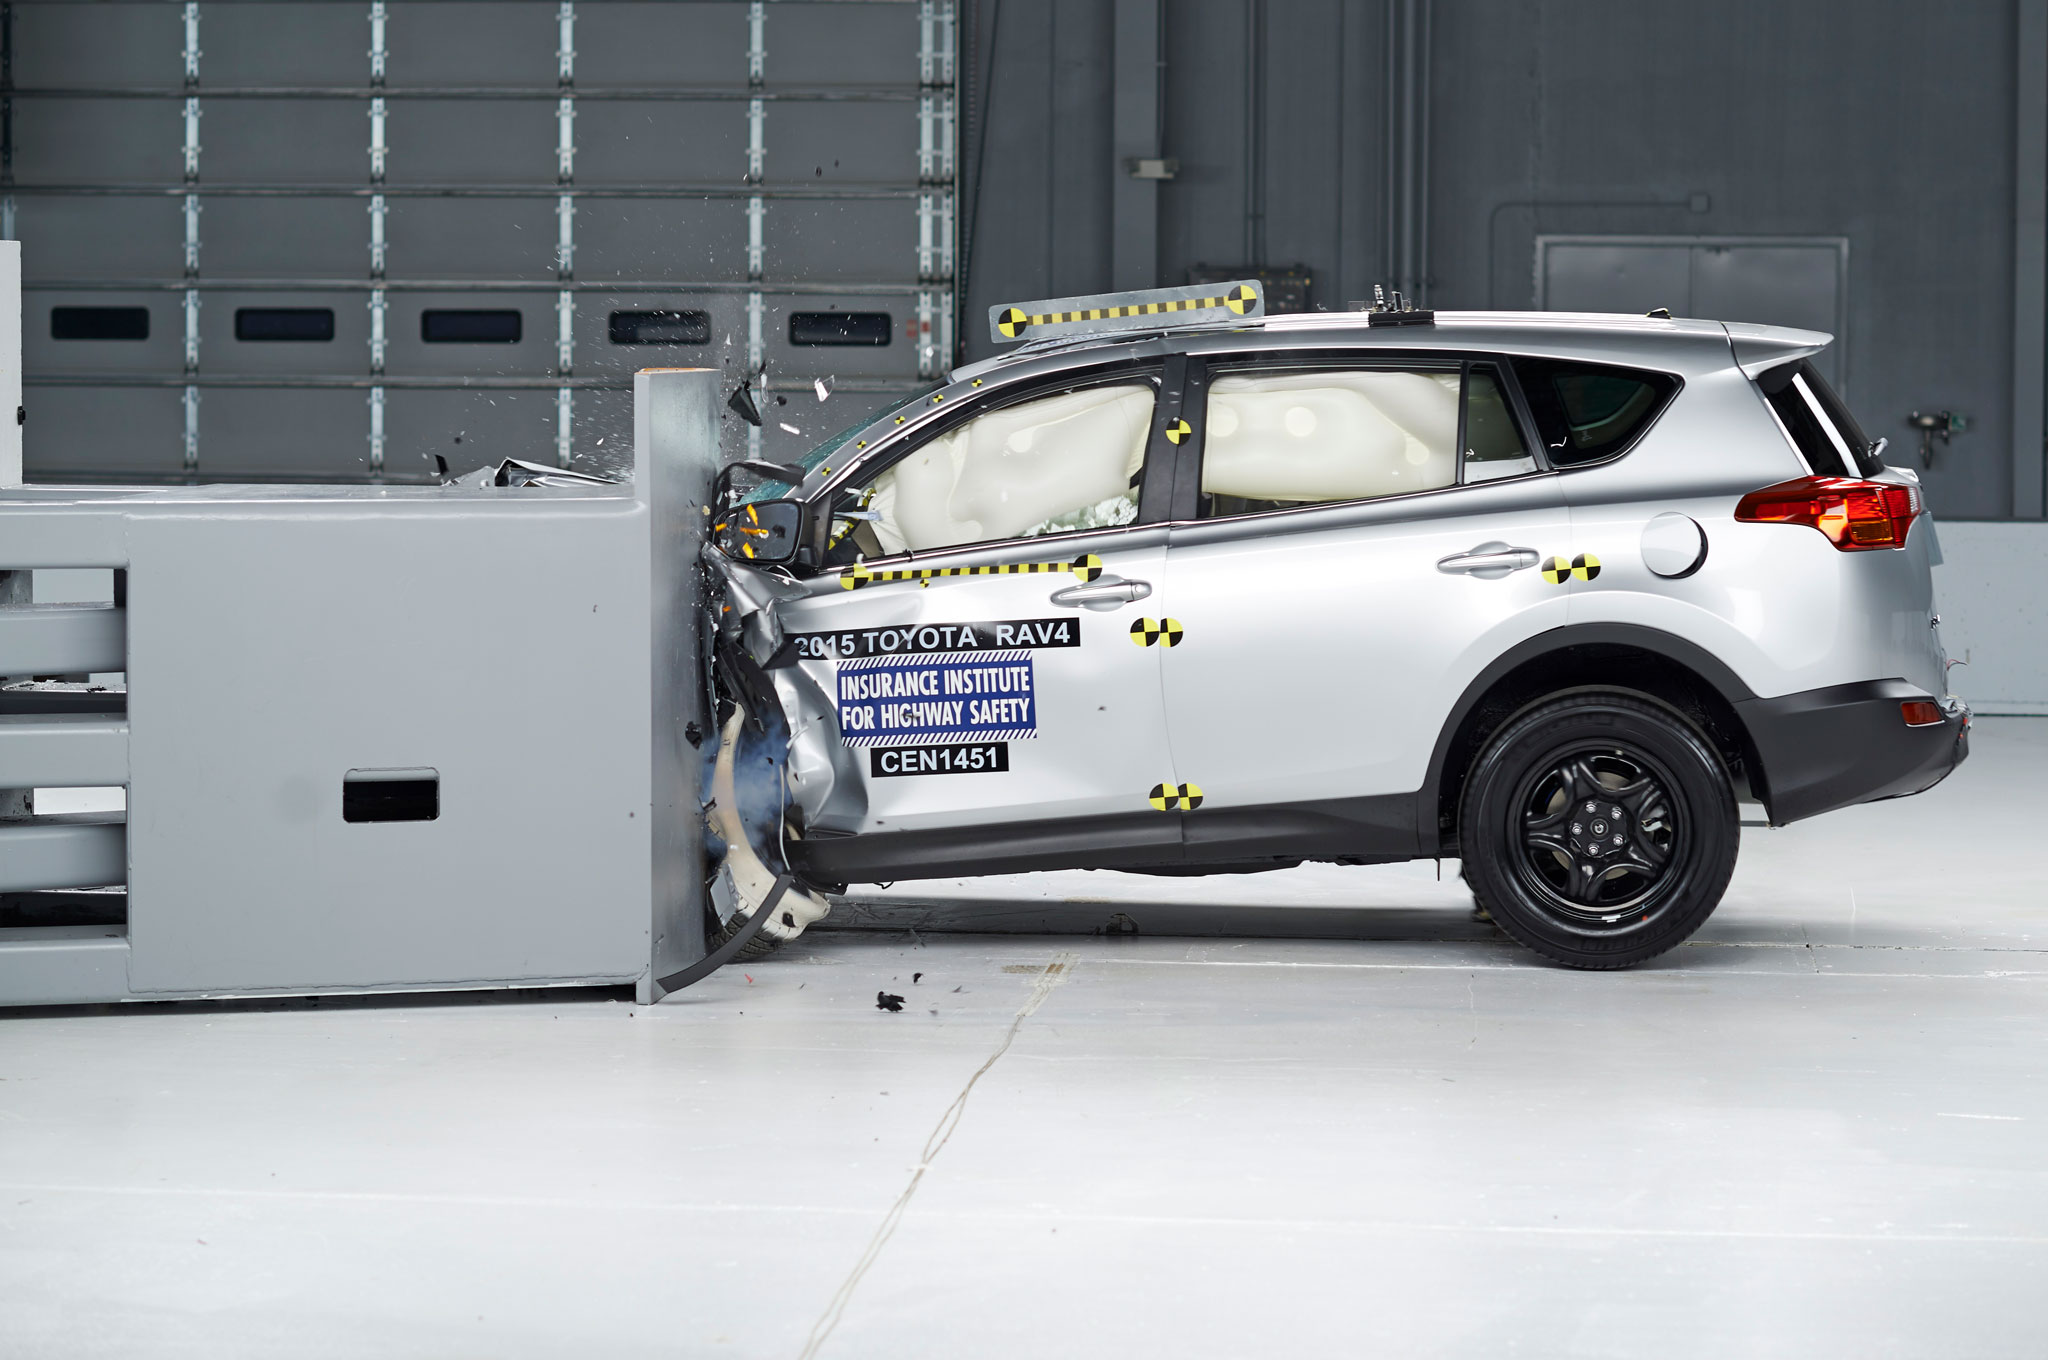 2015 Toyota RAV4 in IIHS testing